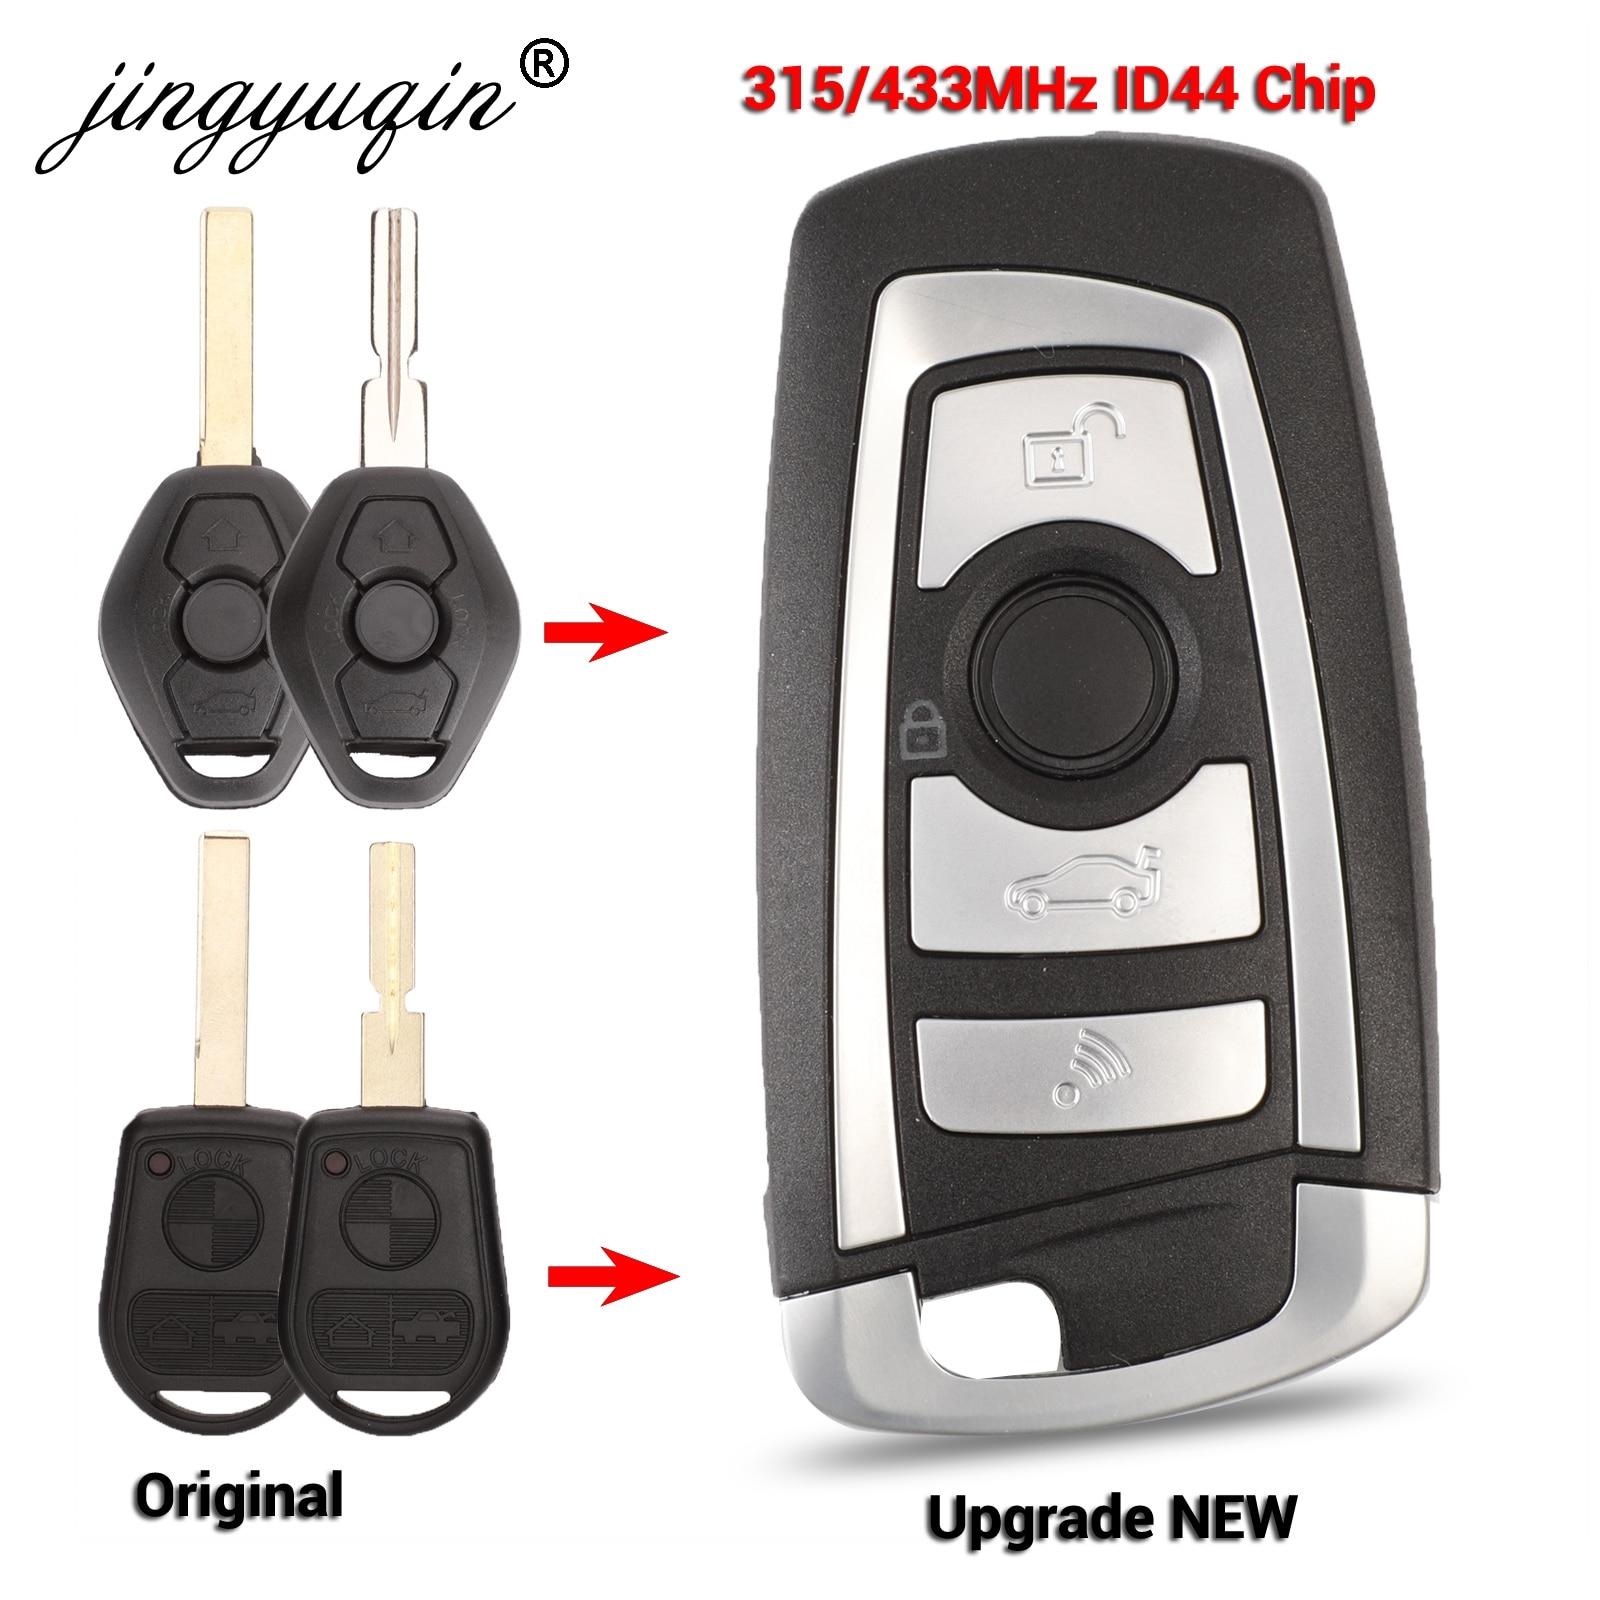 Jingyuqin EWS Flip modificado de llave de control remoto botón 4 315 MHz/433 MHz PCF7935AA ID44 Chip para BMW E38 E39 E46 M5 X3 X5 Z3 Z4 HU58 HU92